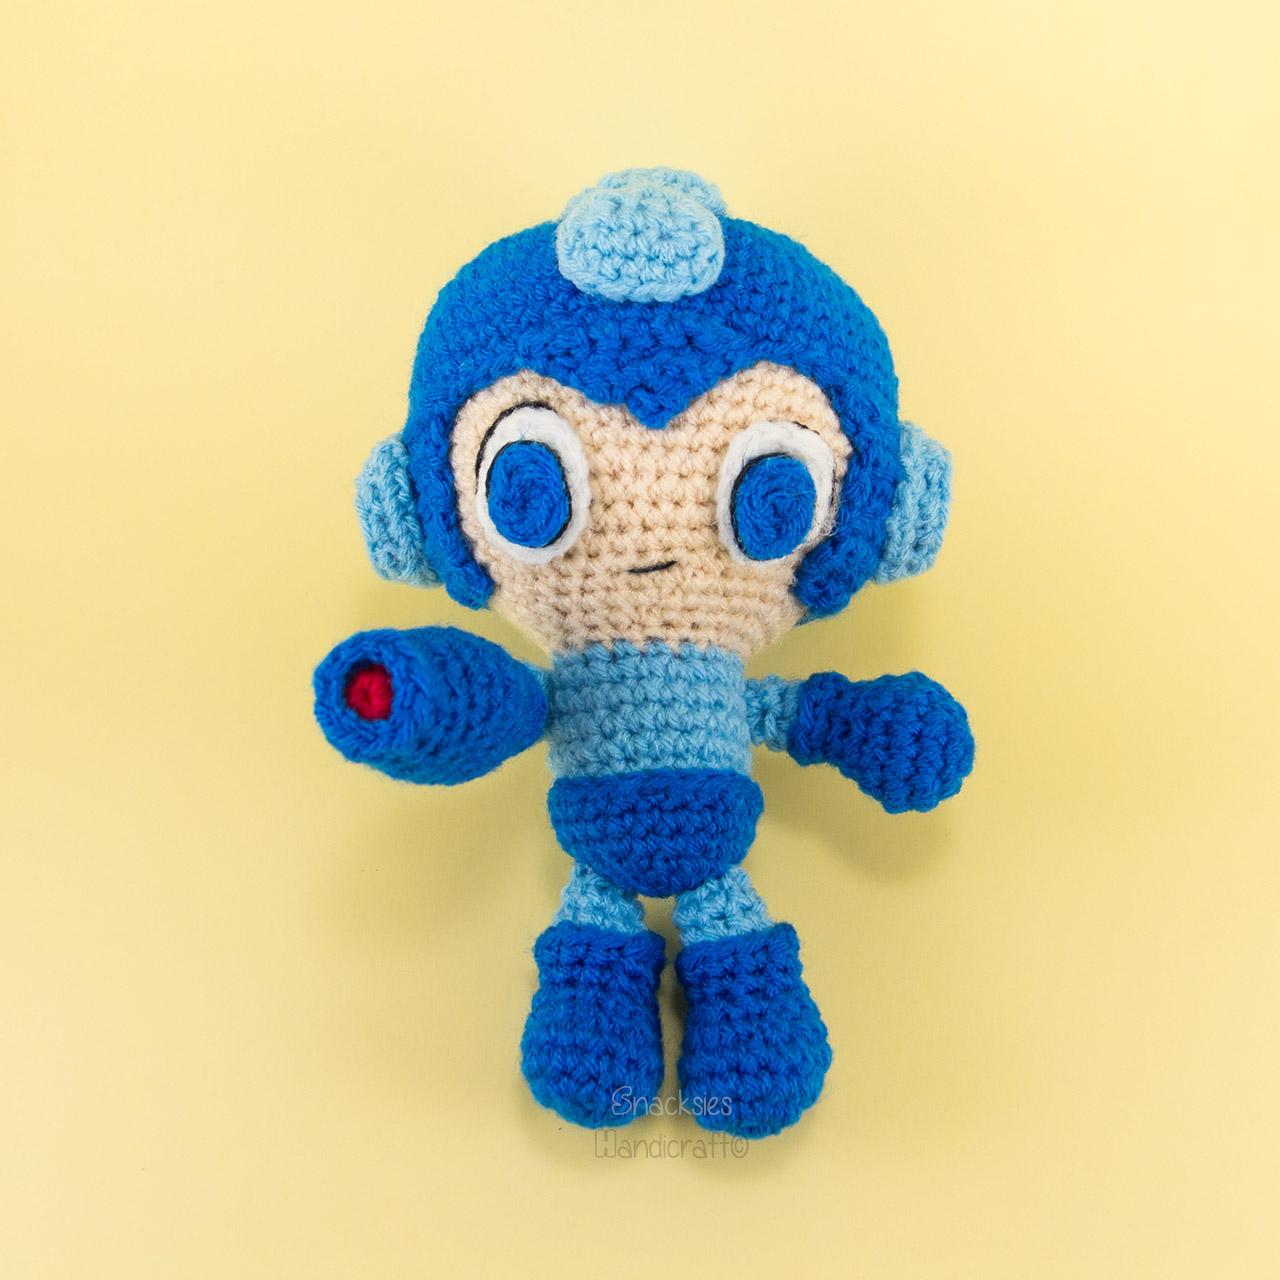 crocheted-rockman-megaman-amigurumi